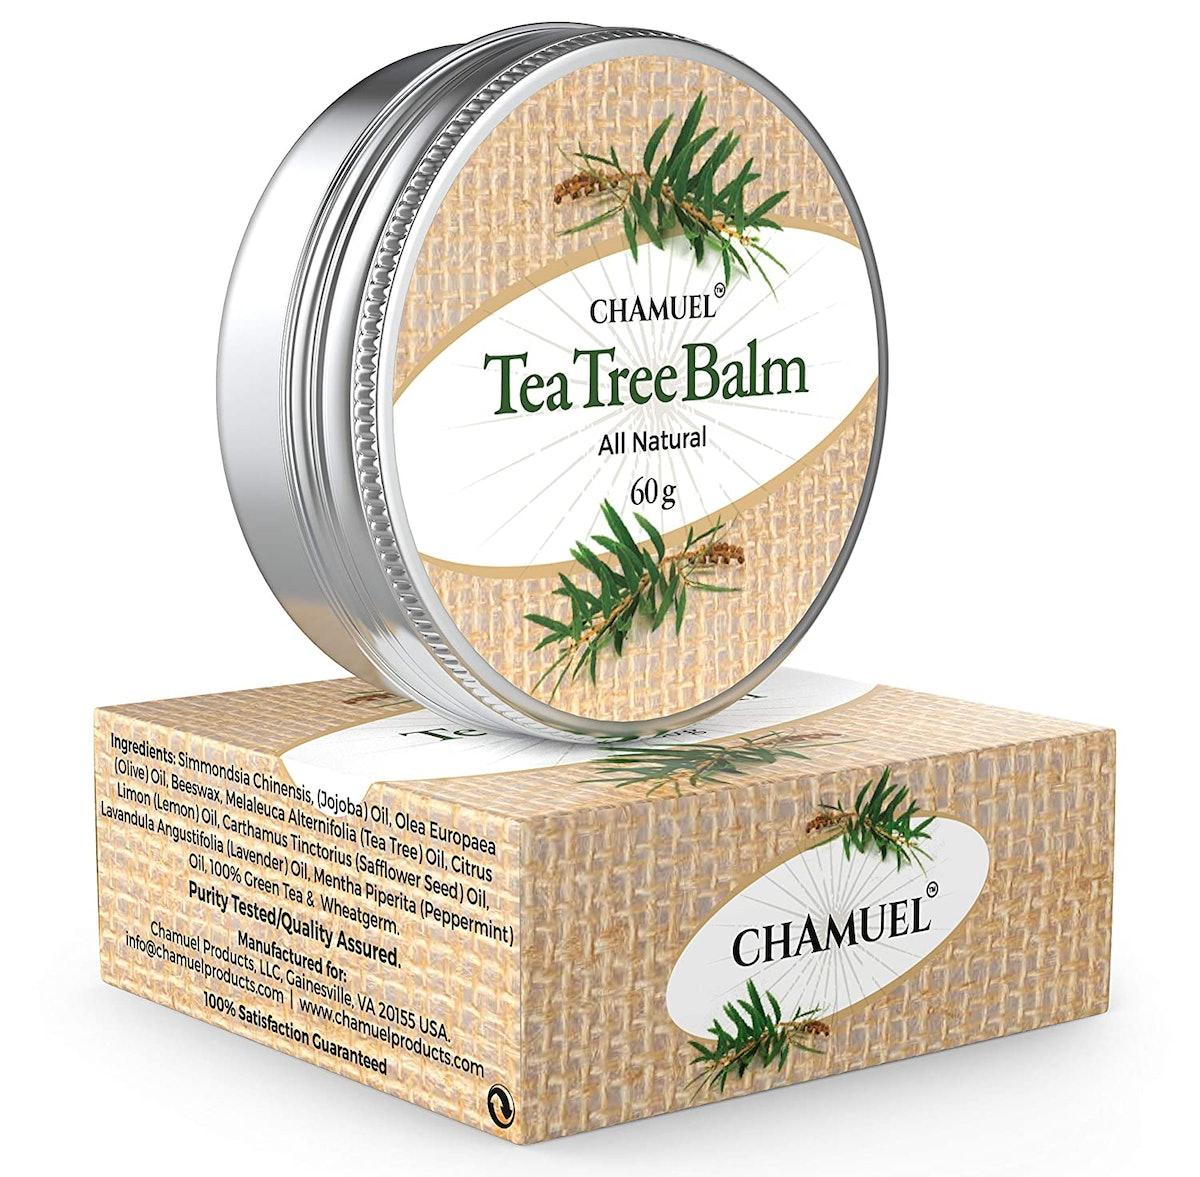 Chamuel Tea Tree Balm